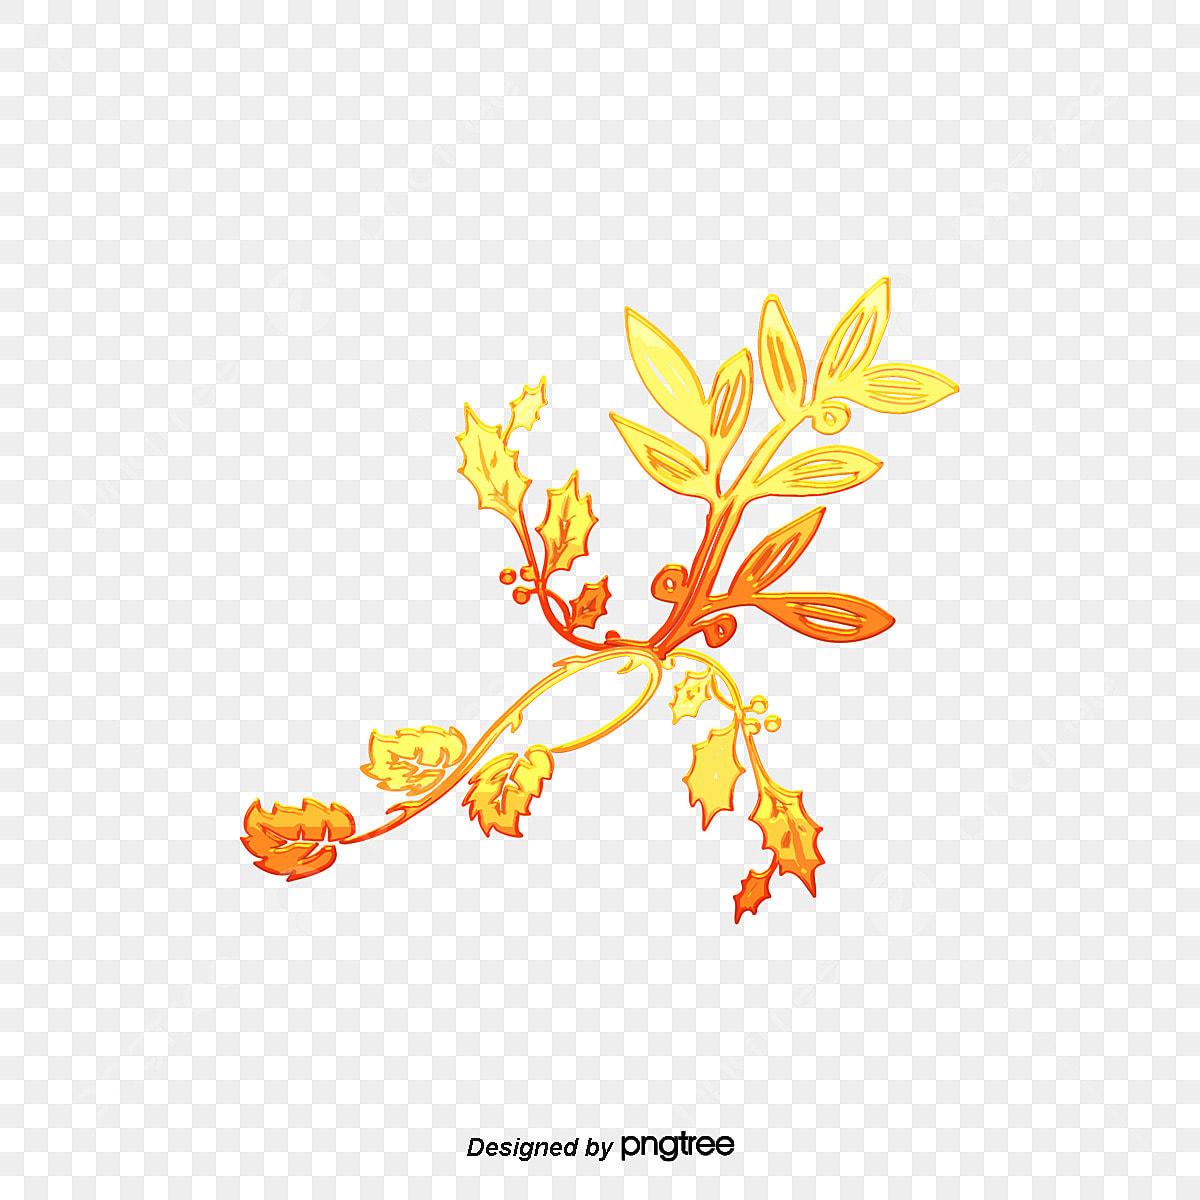 Desenhos Pintados A Mao De Flores Douradas Petalas Pintados A